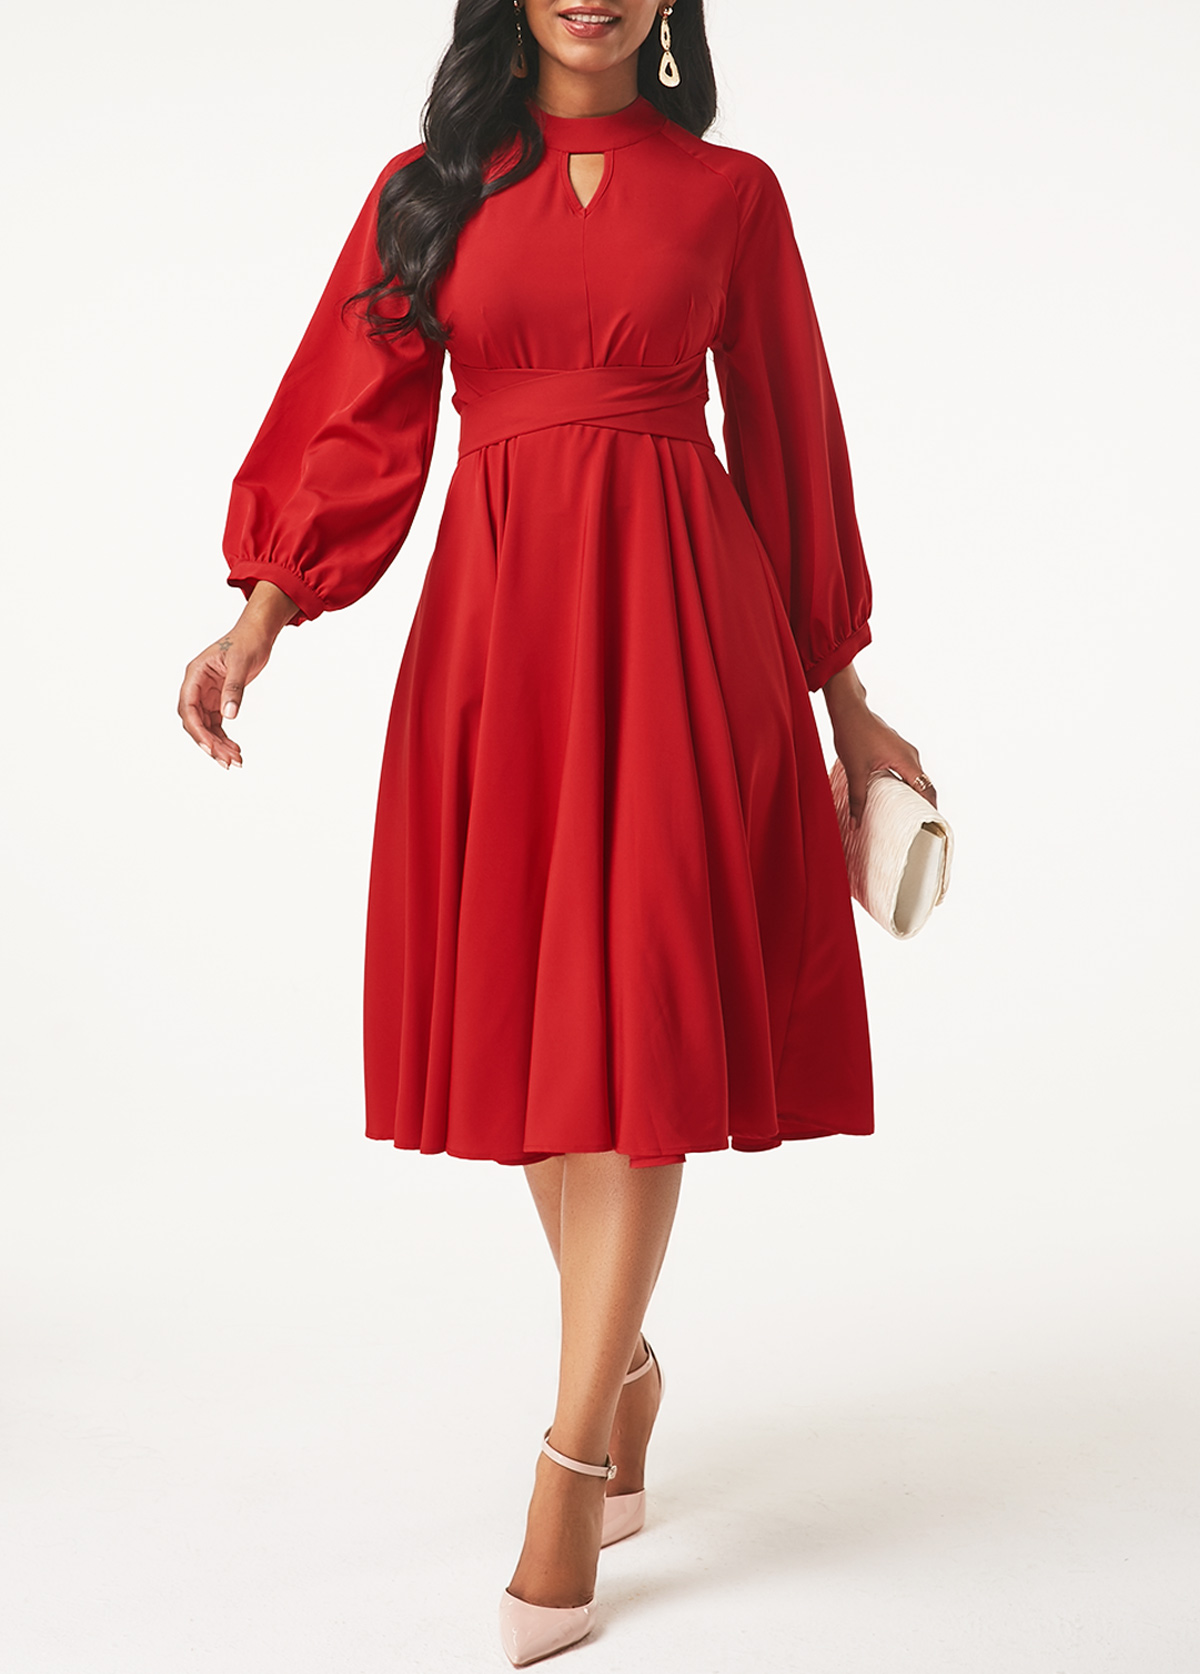 ROTITA Keyhole Neckline Lantern Sleeve Red Dress